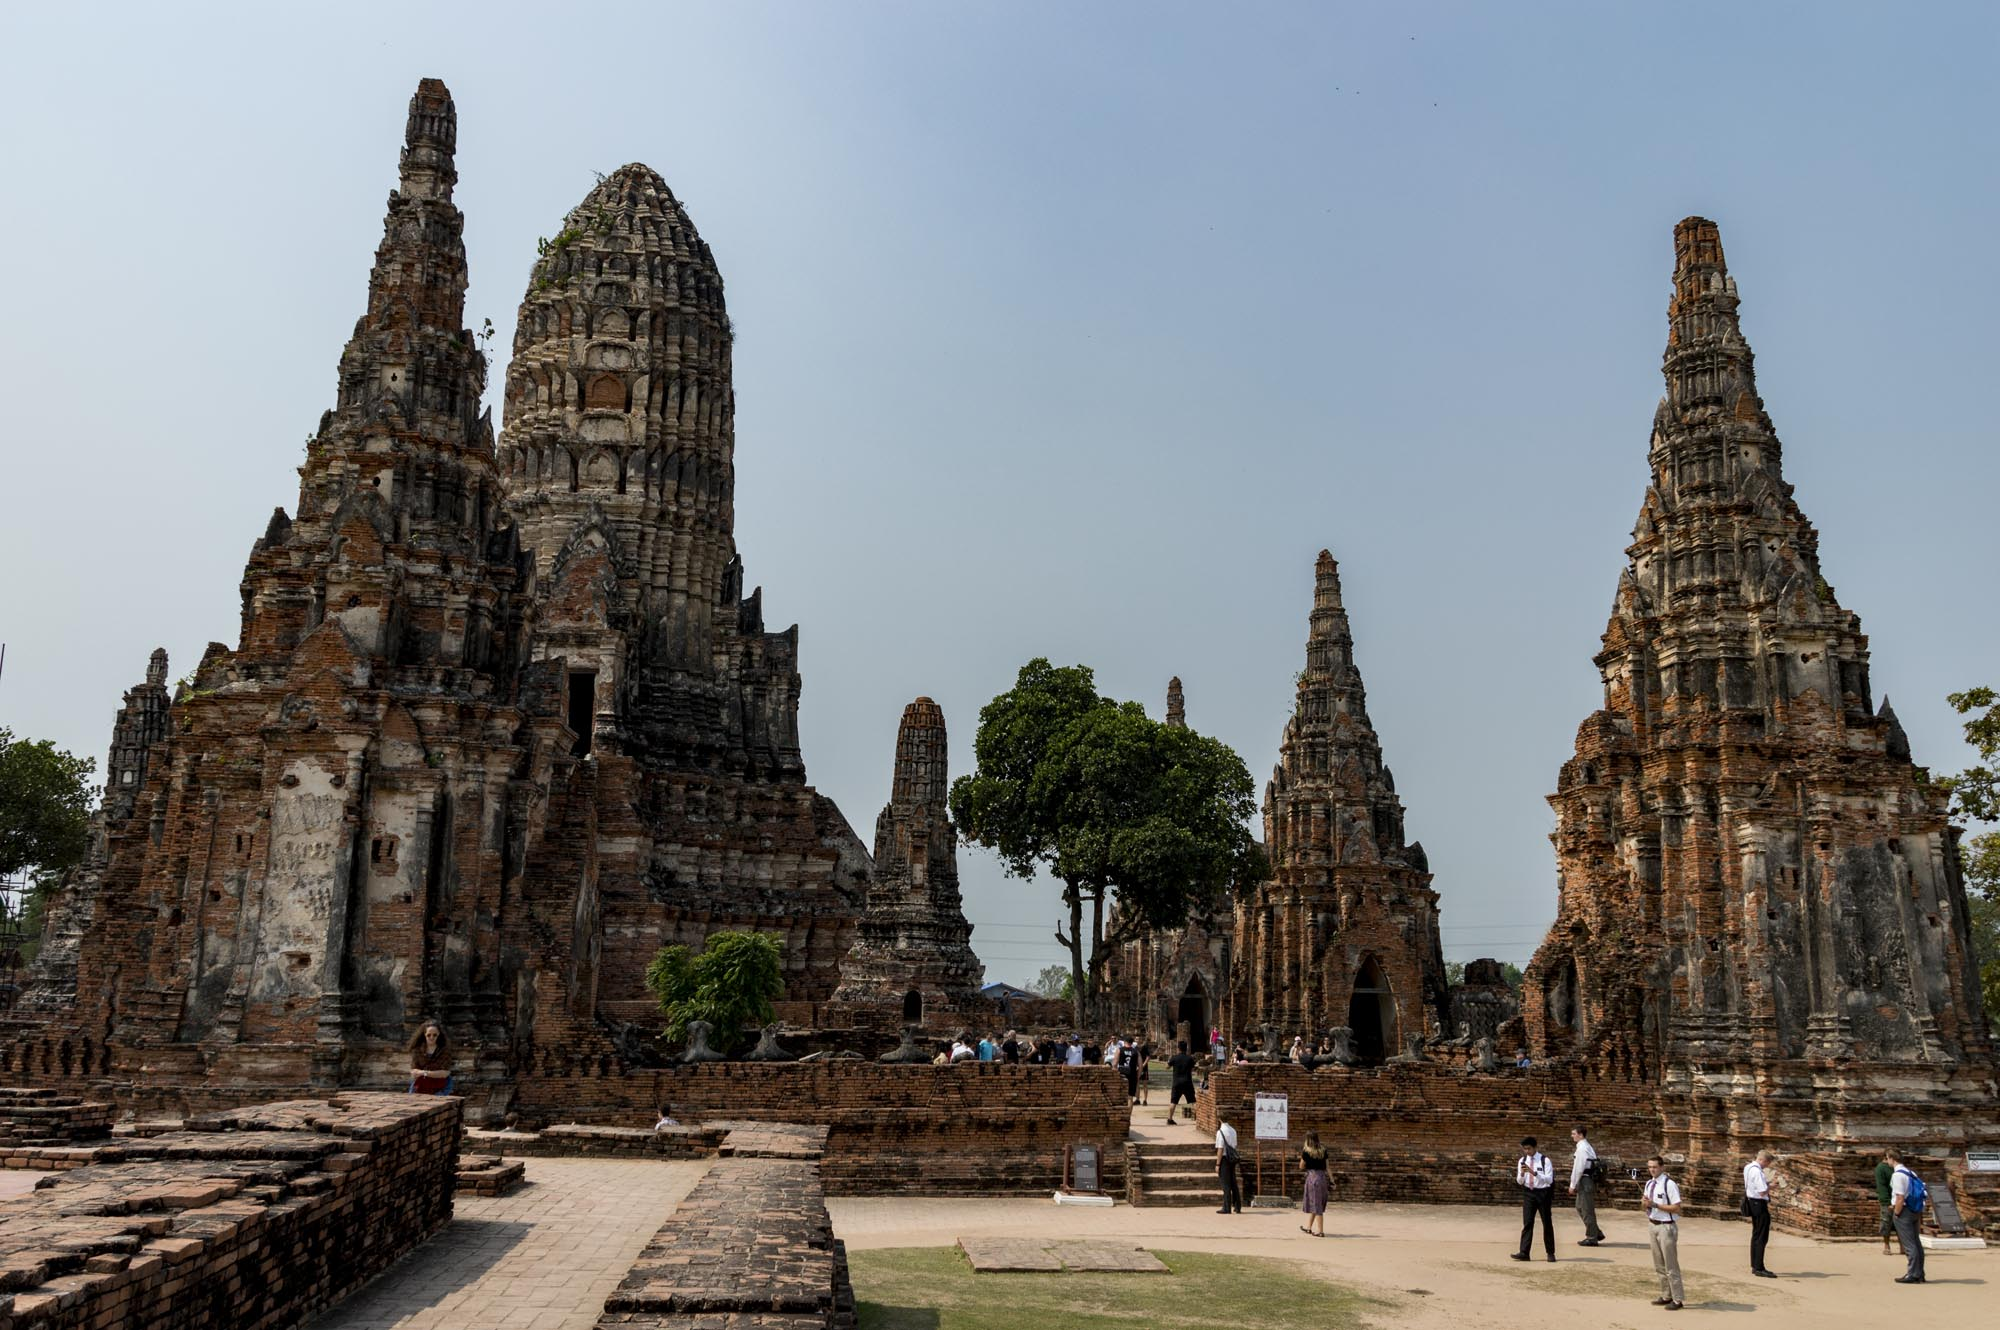 Ayutthaya temples: Wat Chai Wattanaram